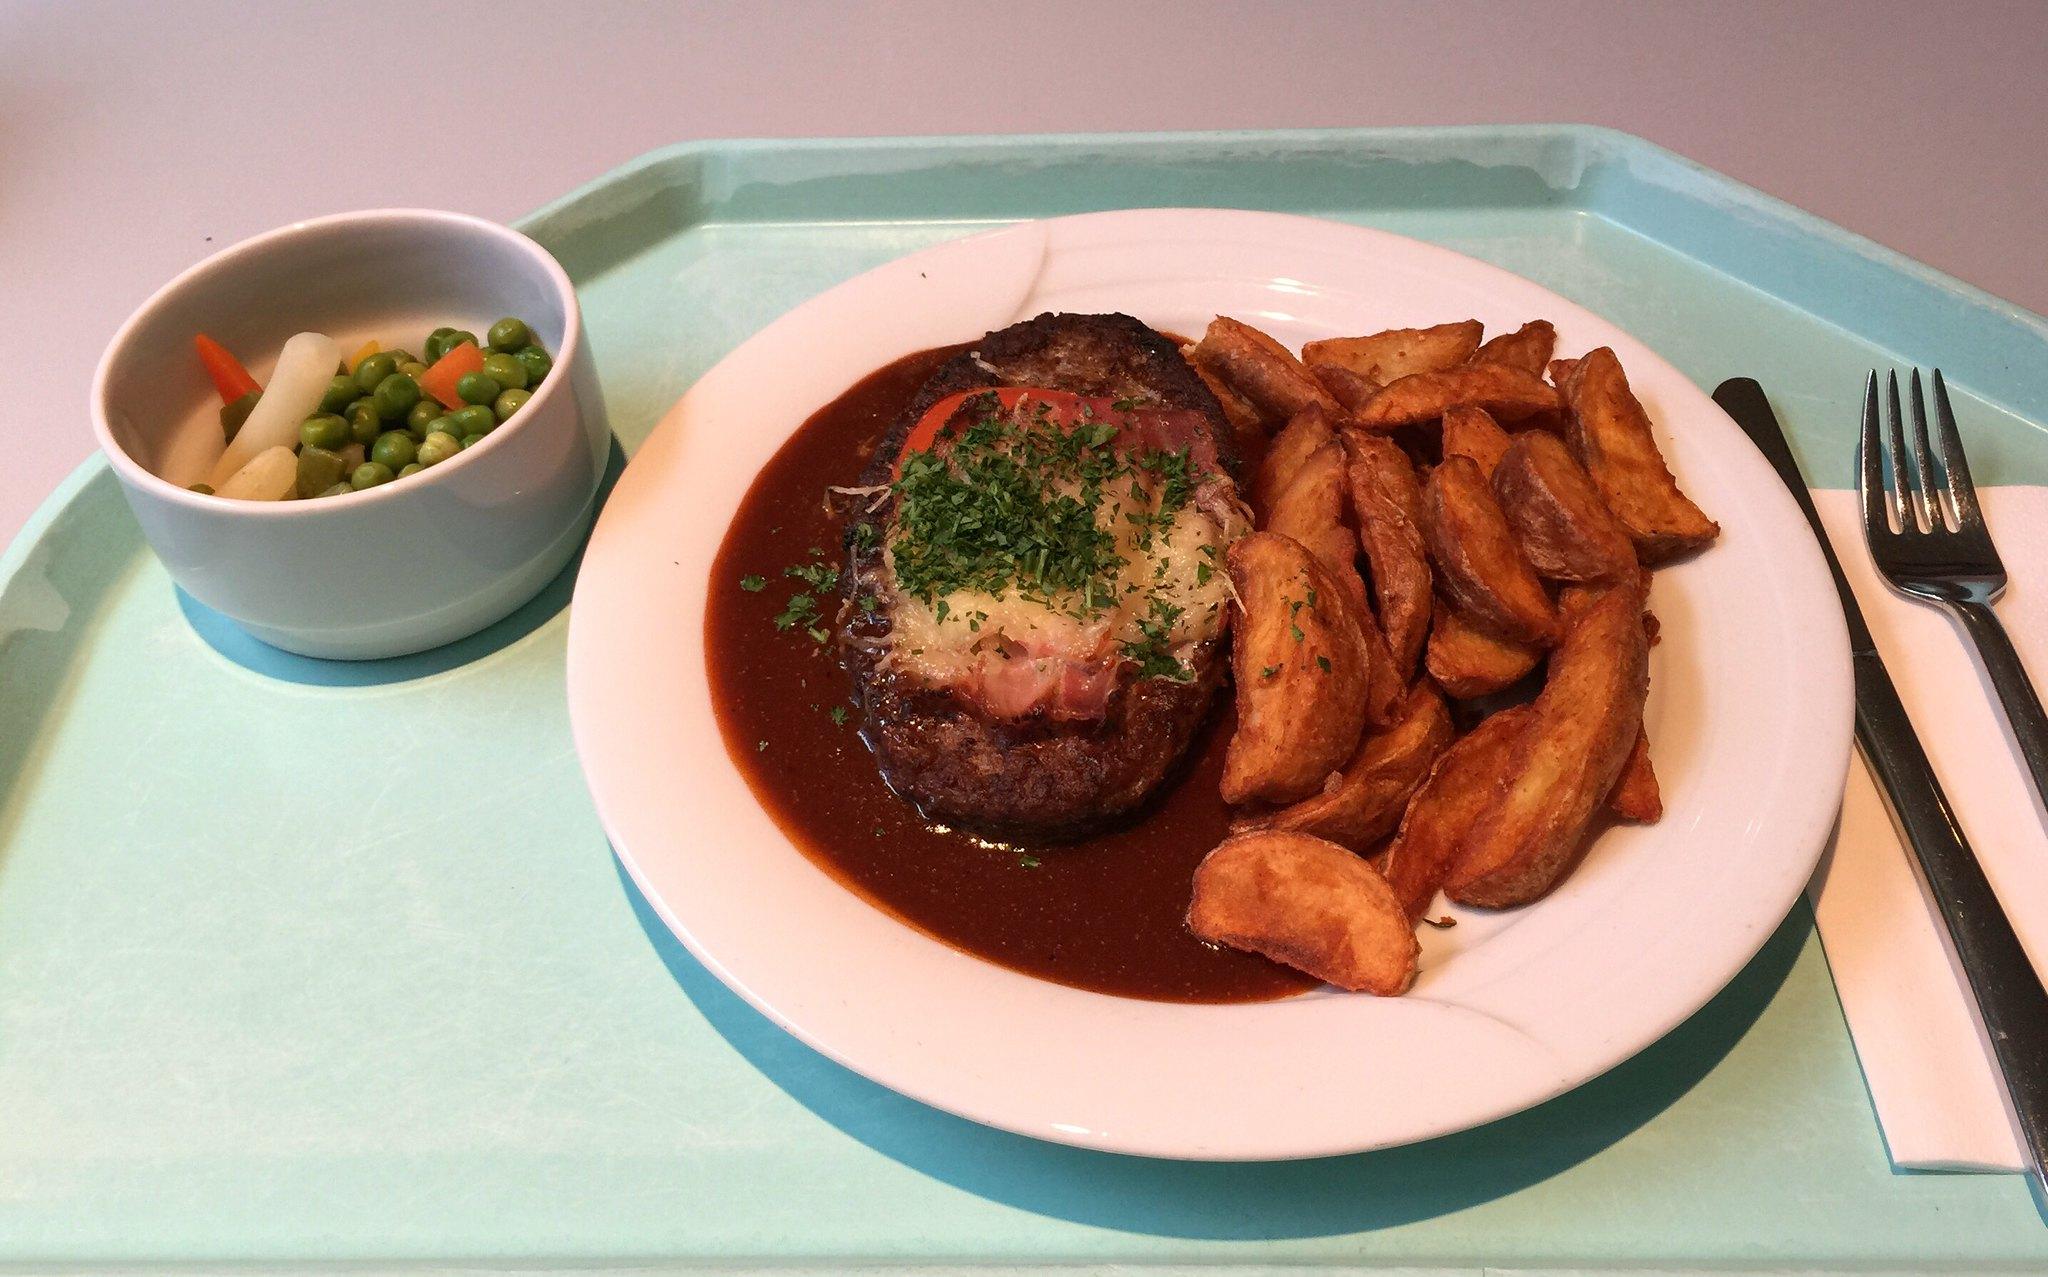 Salisbury steaks with BBQ sauce & country potatoes / Rinderhacksteak mit BBQ-Sauce & Country Potatoes